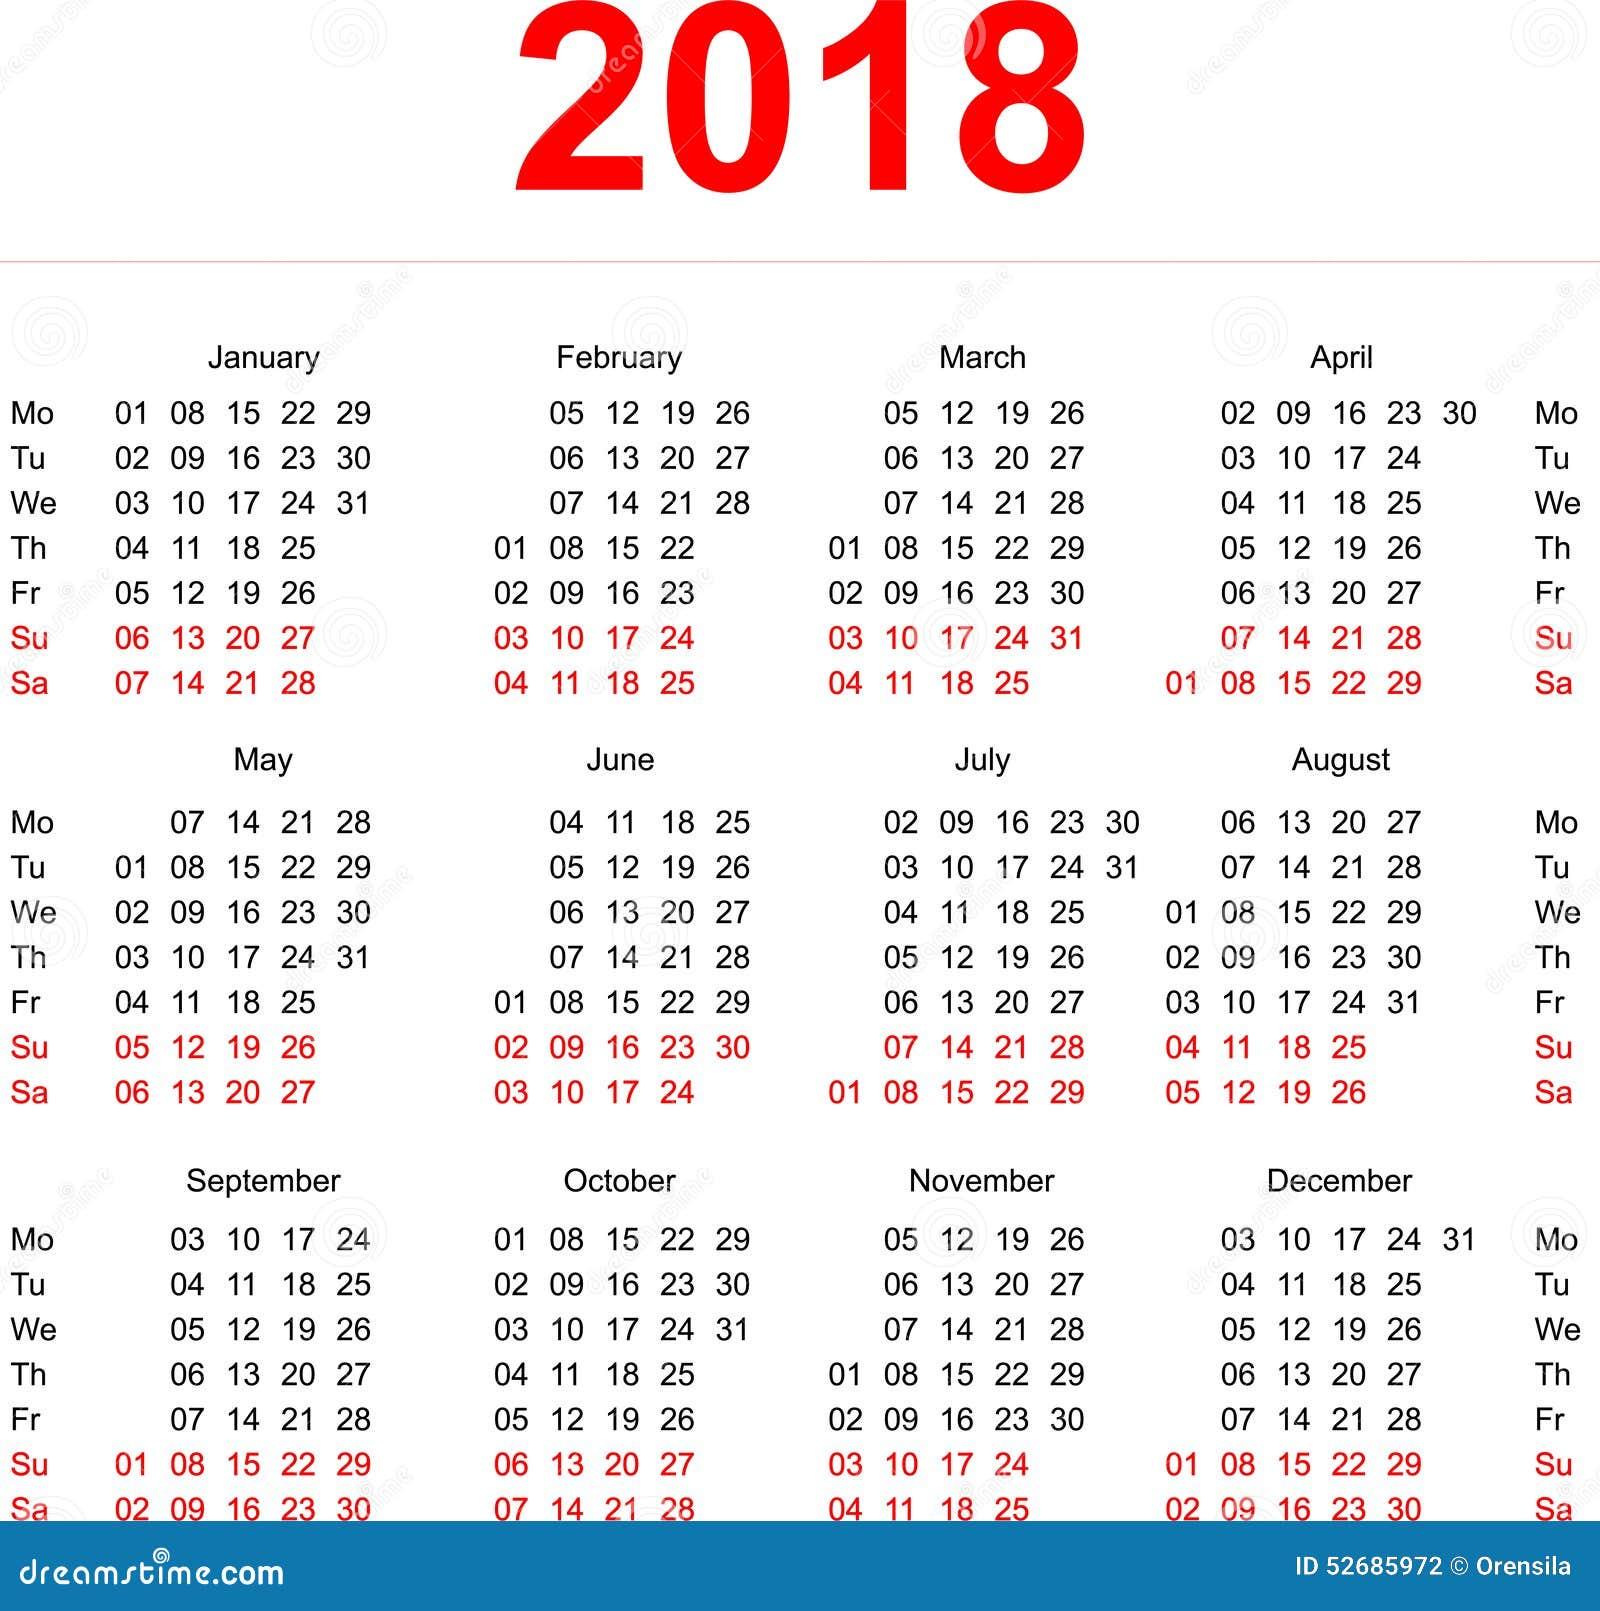 Gratis Dejtingsidor 2018 Veckor